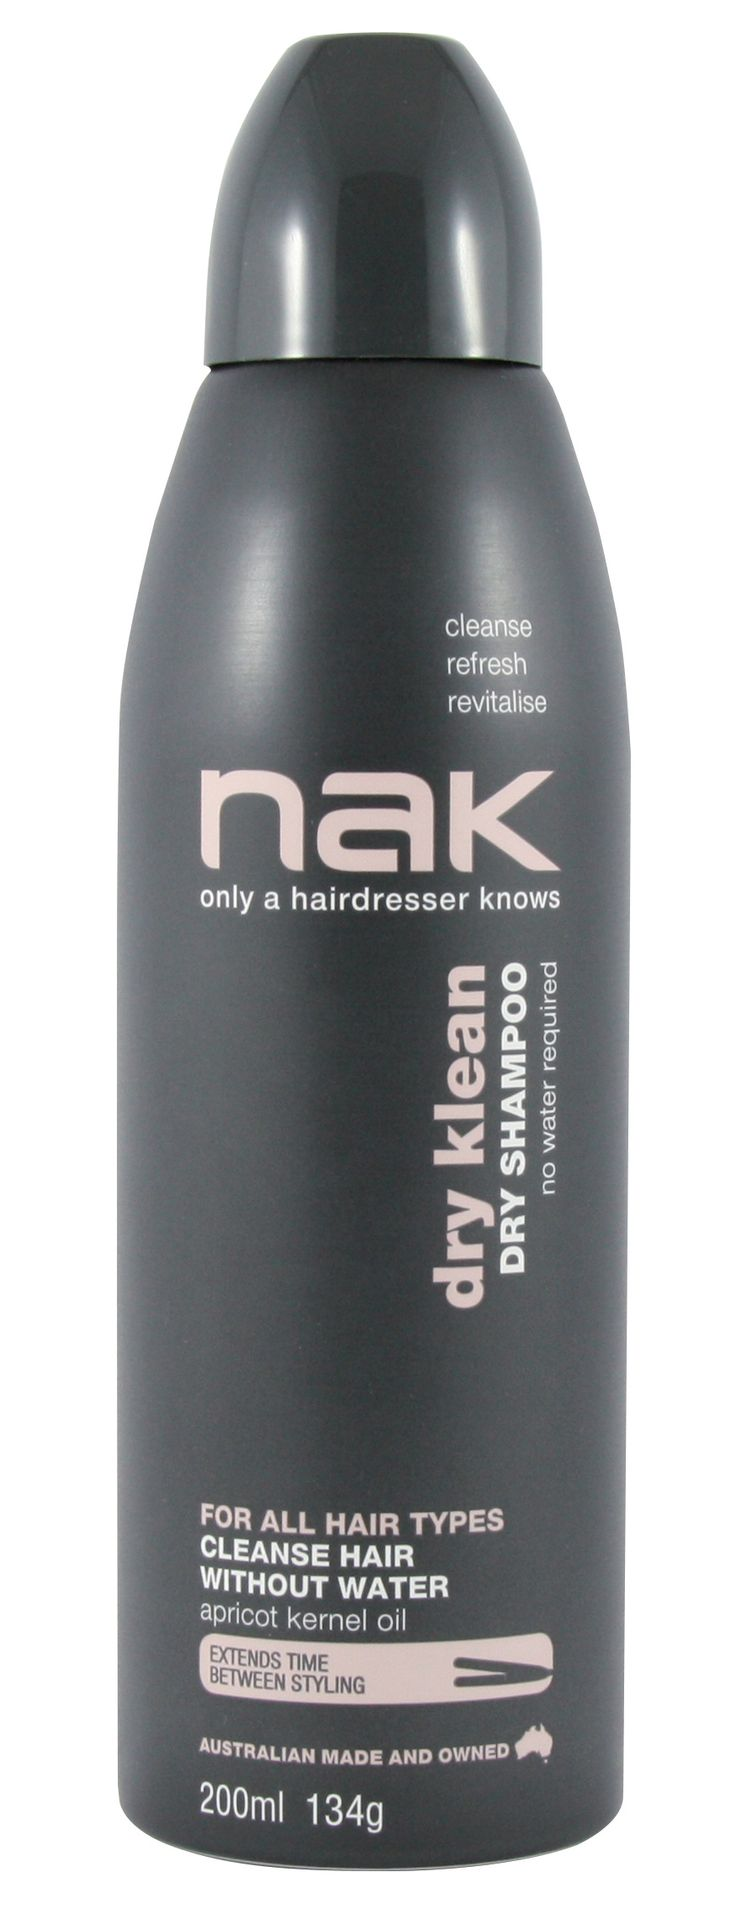 #NAKhair #DryShampoo #Dryklean #hair